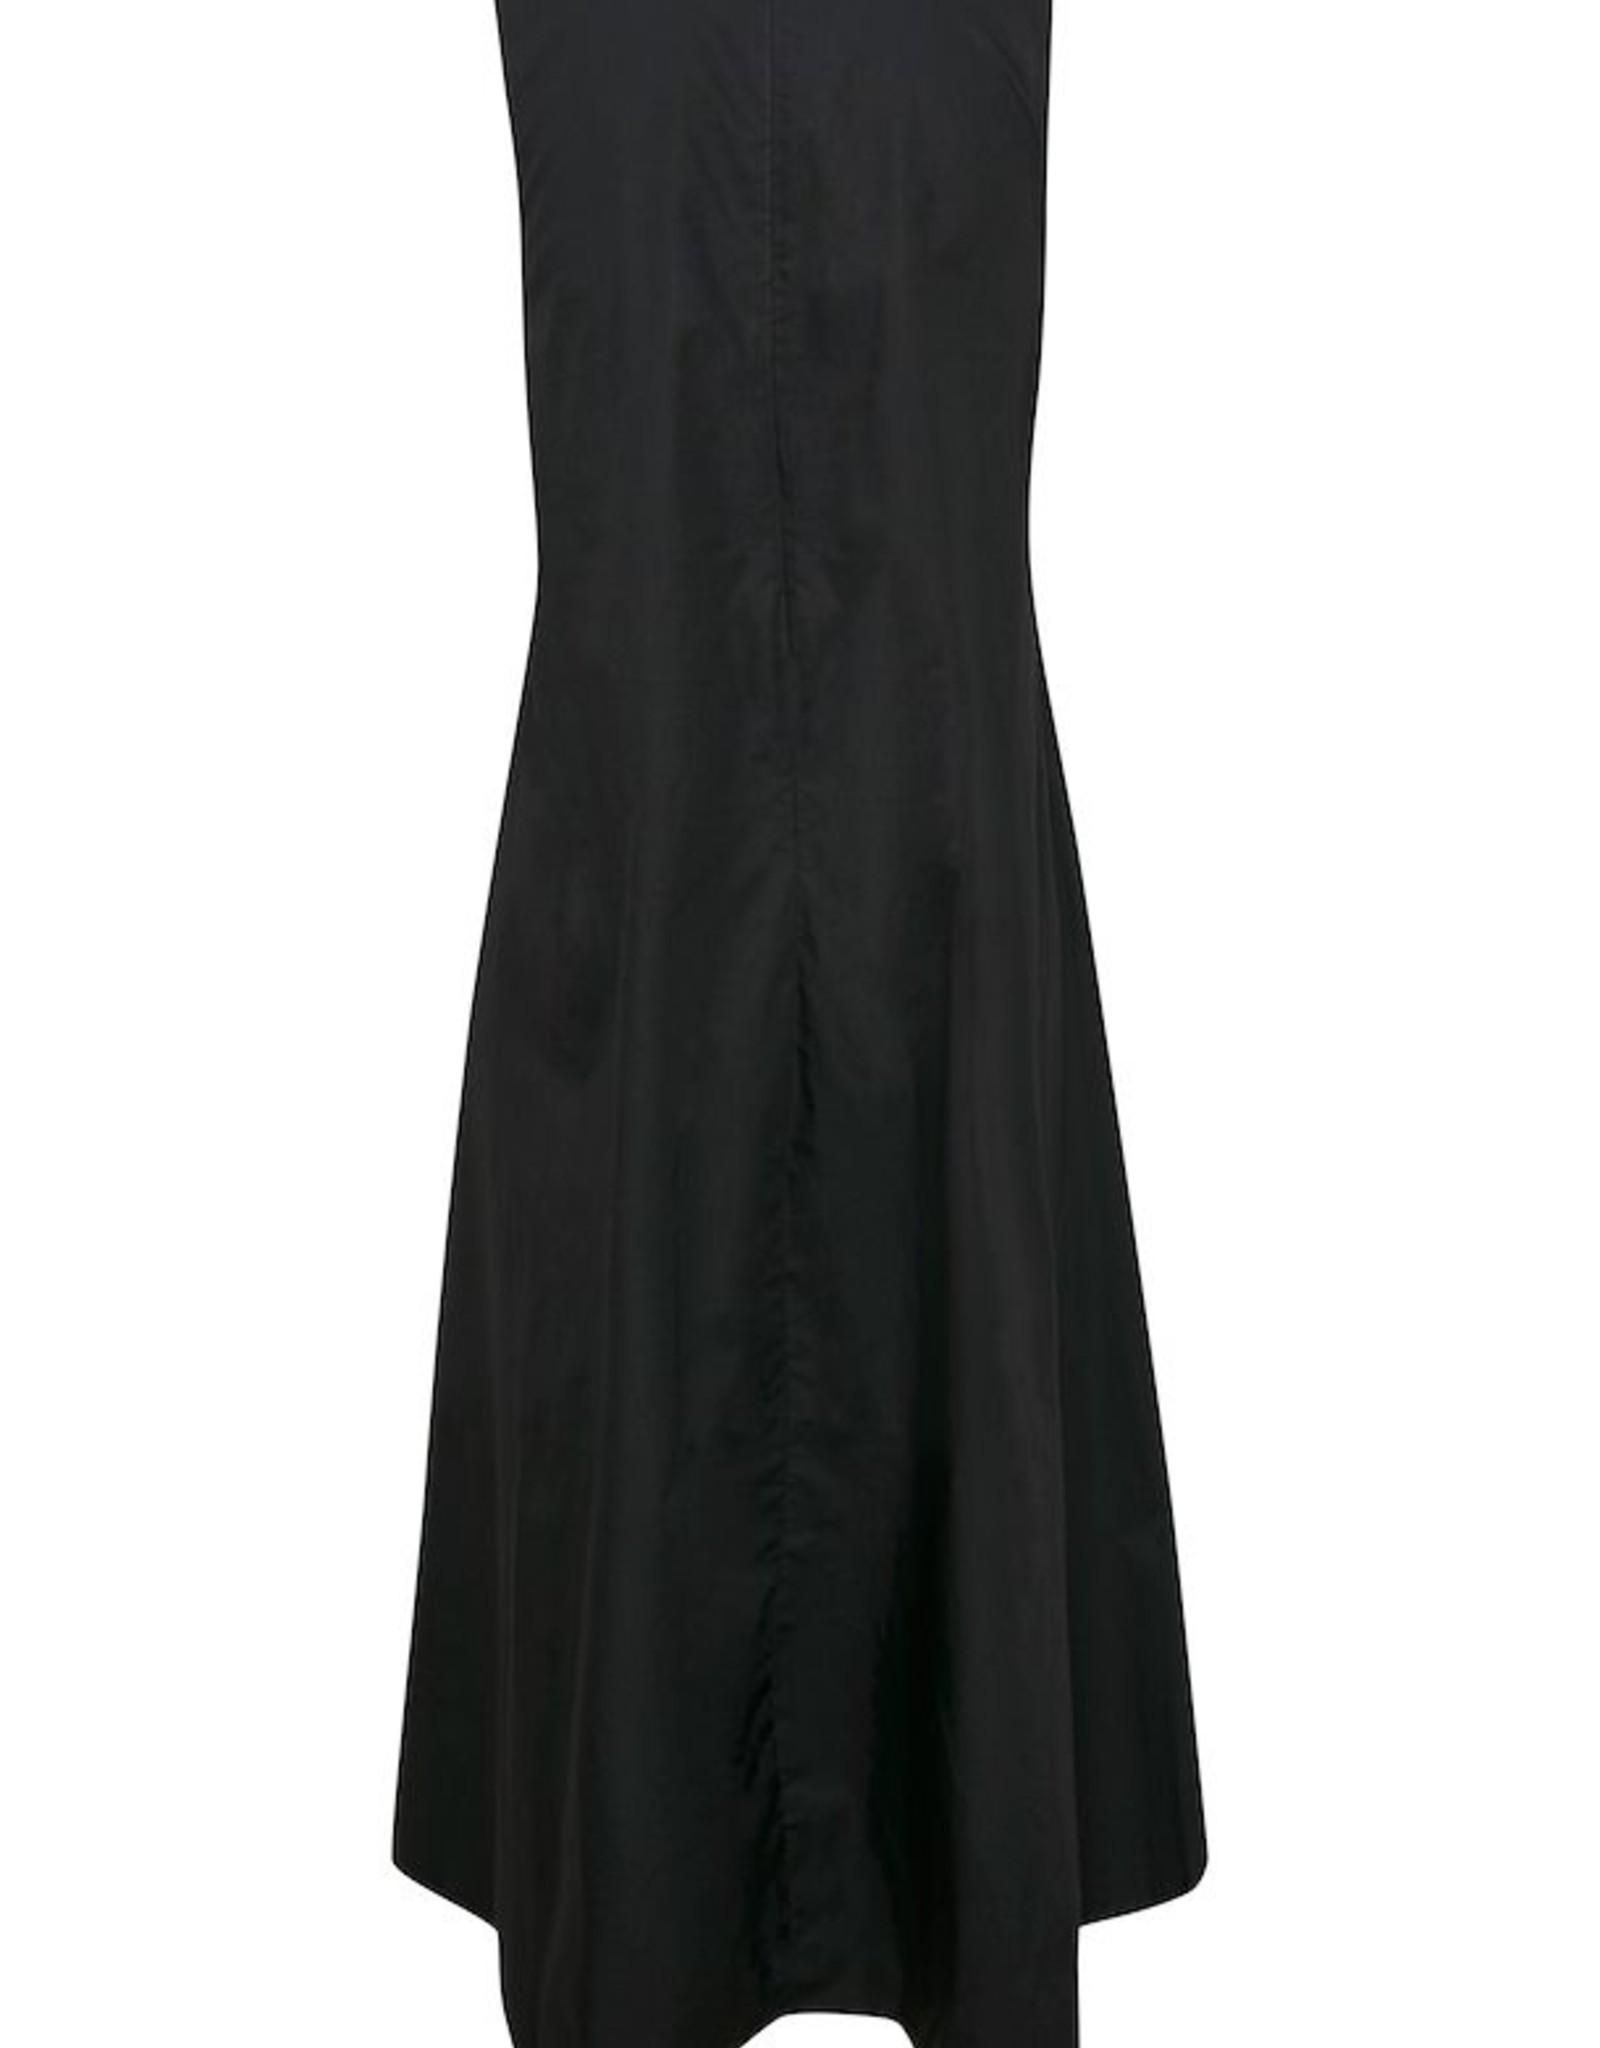 Gestuz Sori Short Dress Black